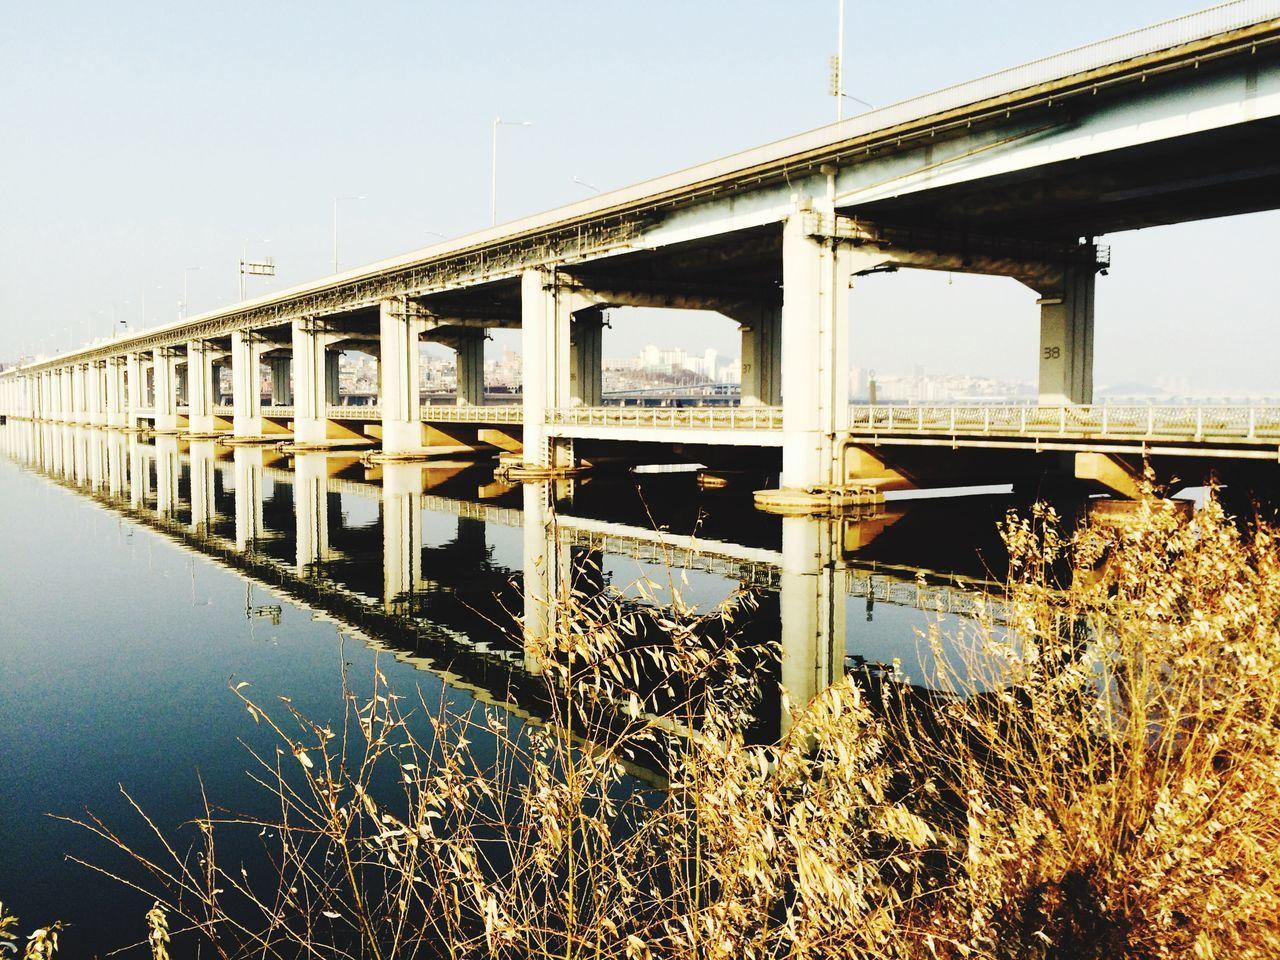 Bridge On River Against Clear Sky